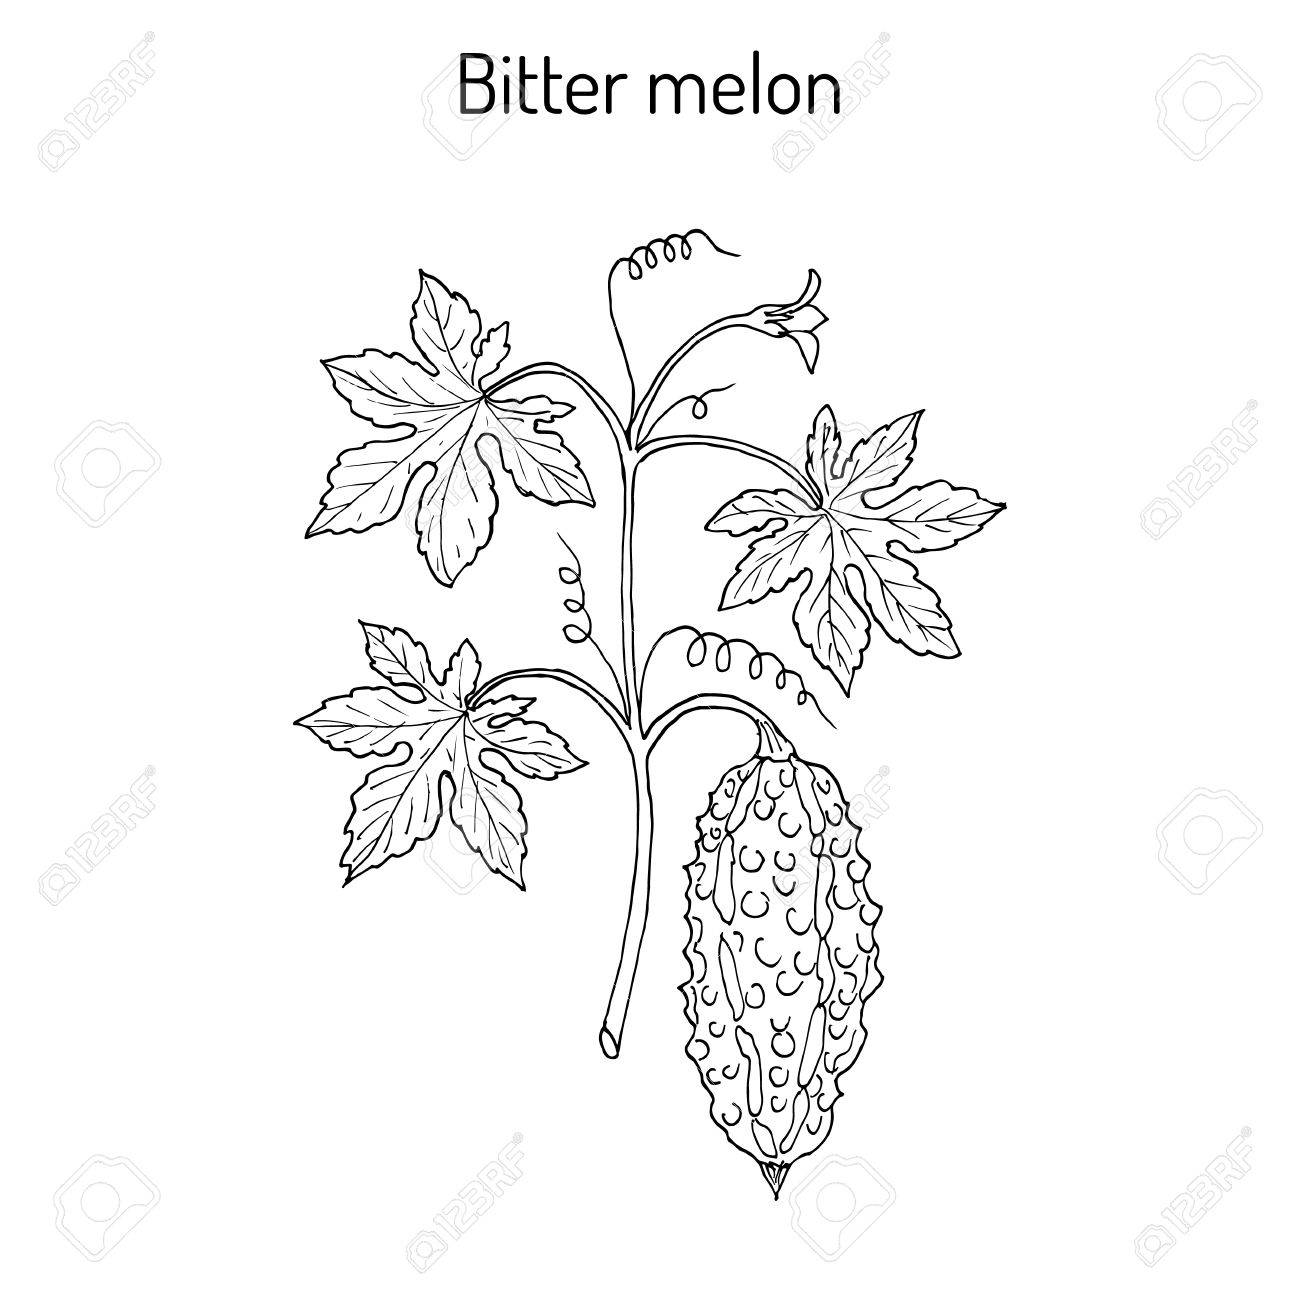 Bitter melon, or balsam-pear Momordica charantia - 74784409